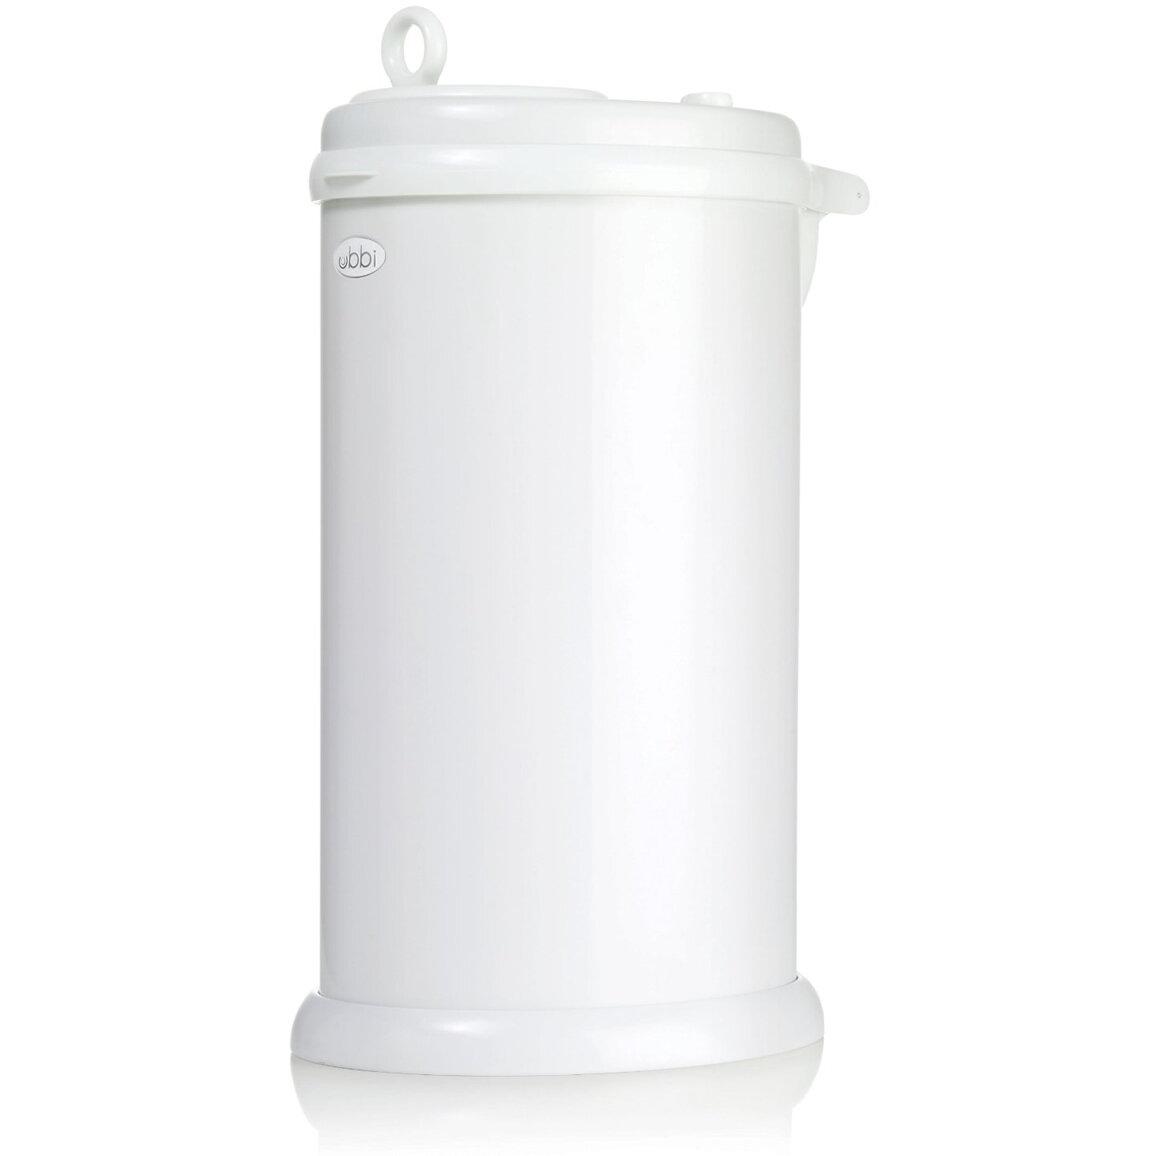 ubbi-diaper-pail-white-33.jpg